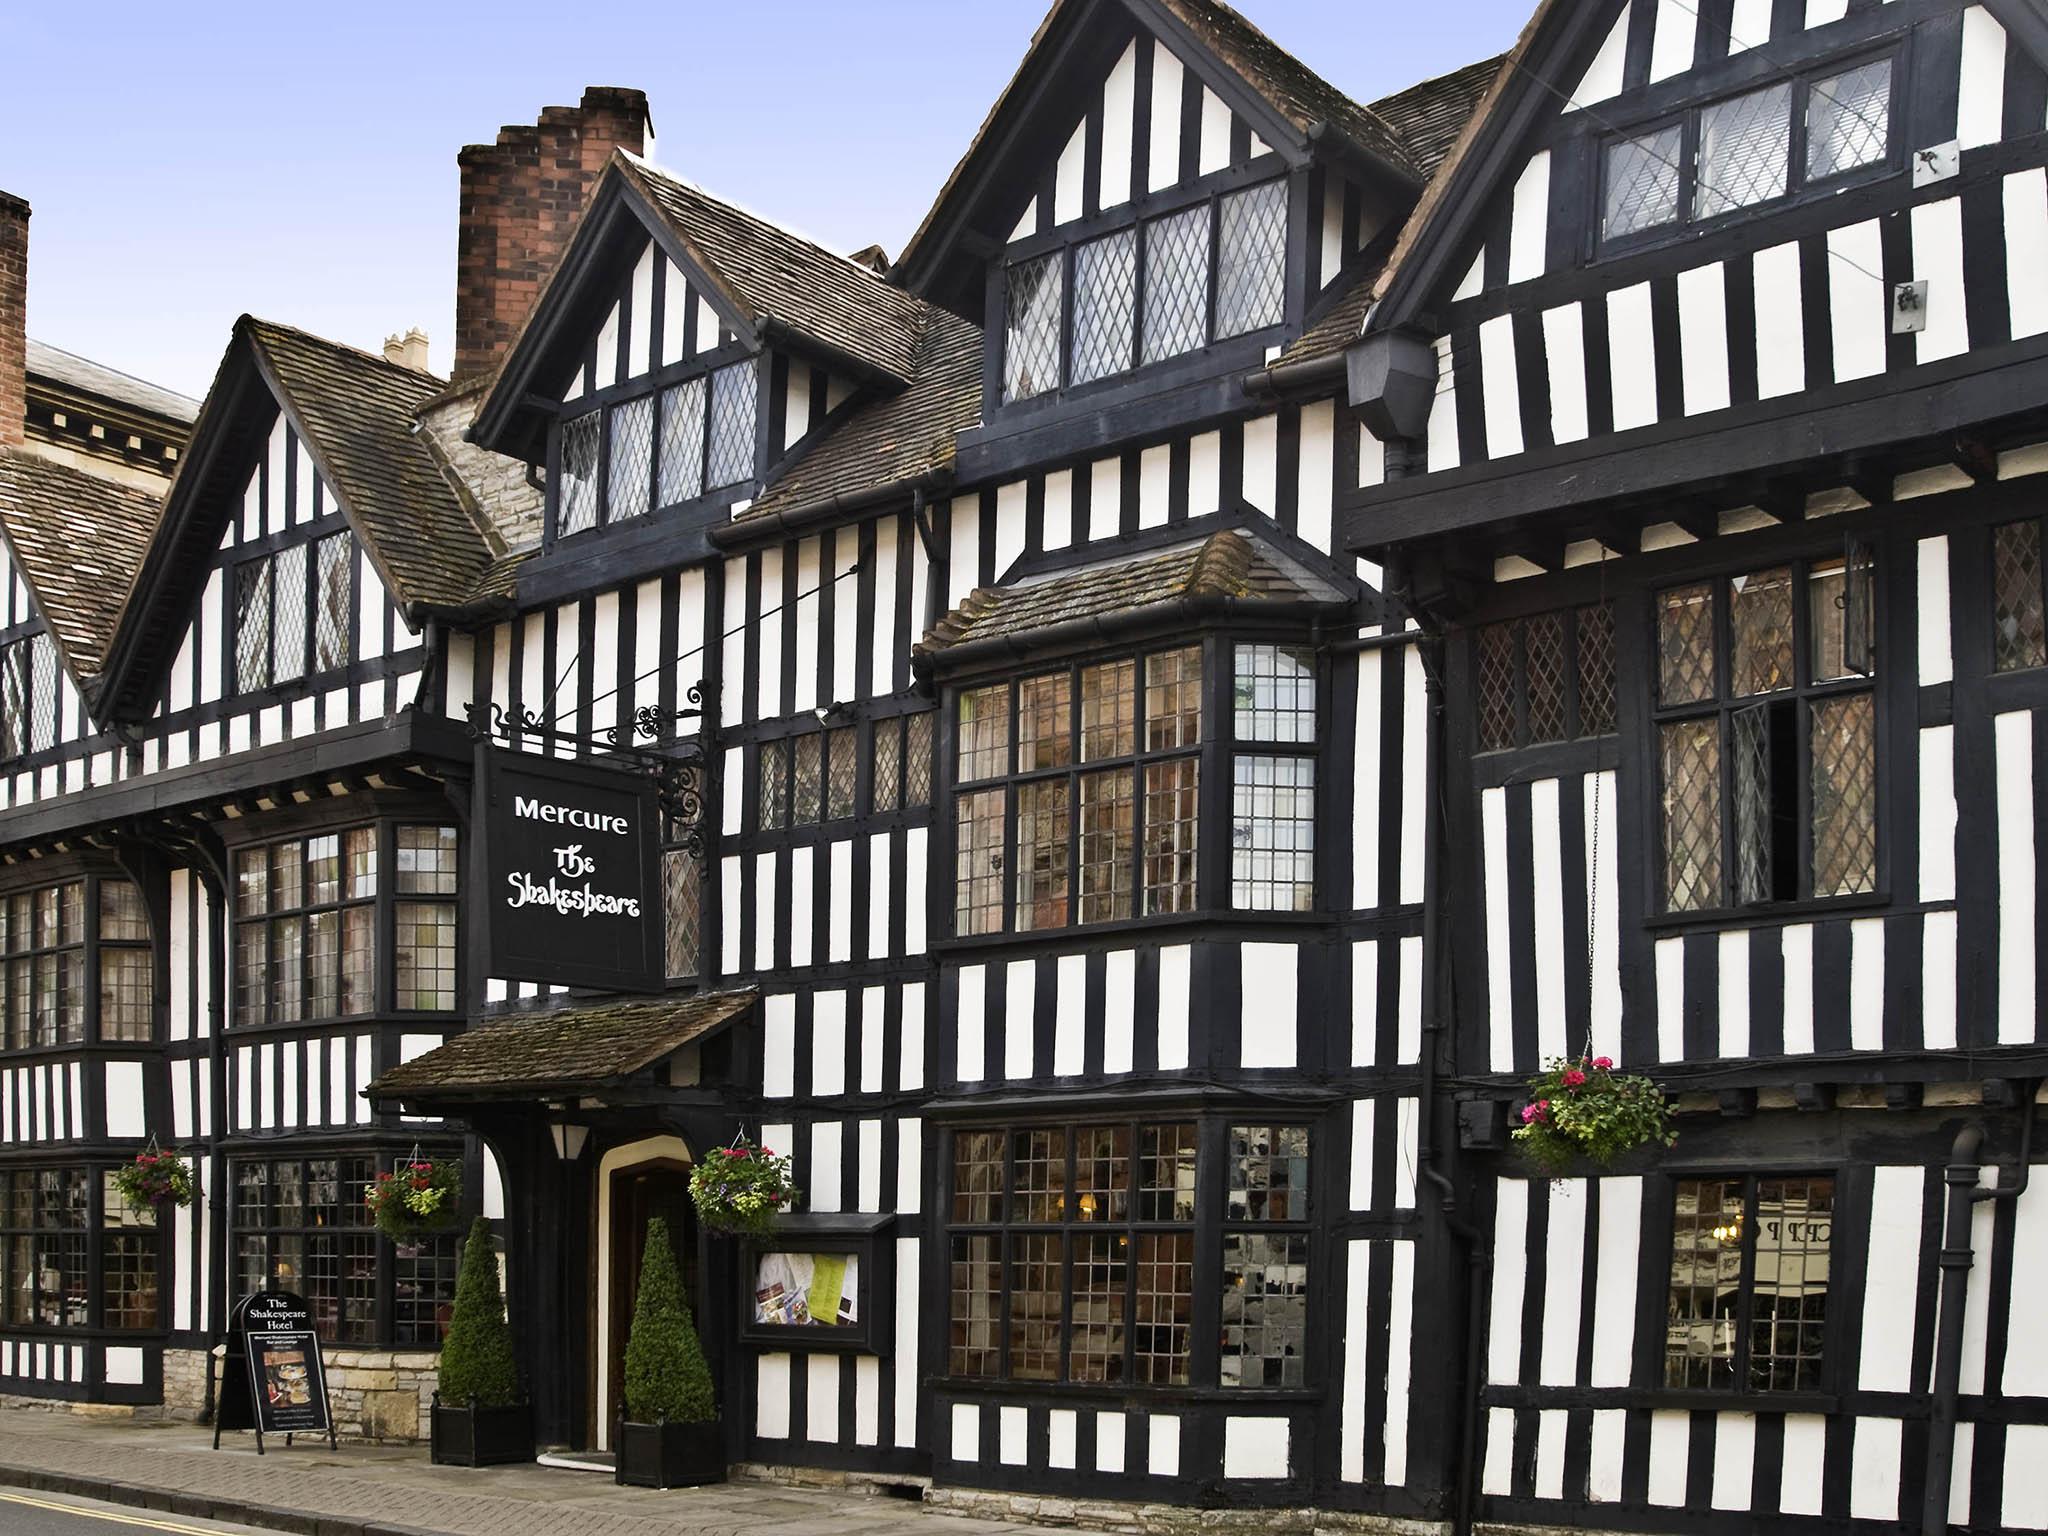 Otel – Mercure Stratford upon Avon Shakespeare Hotel